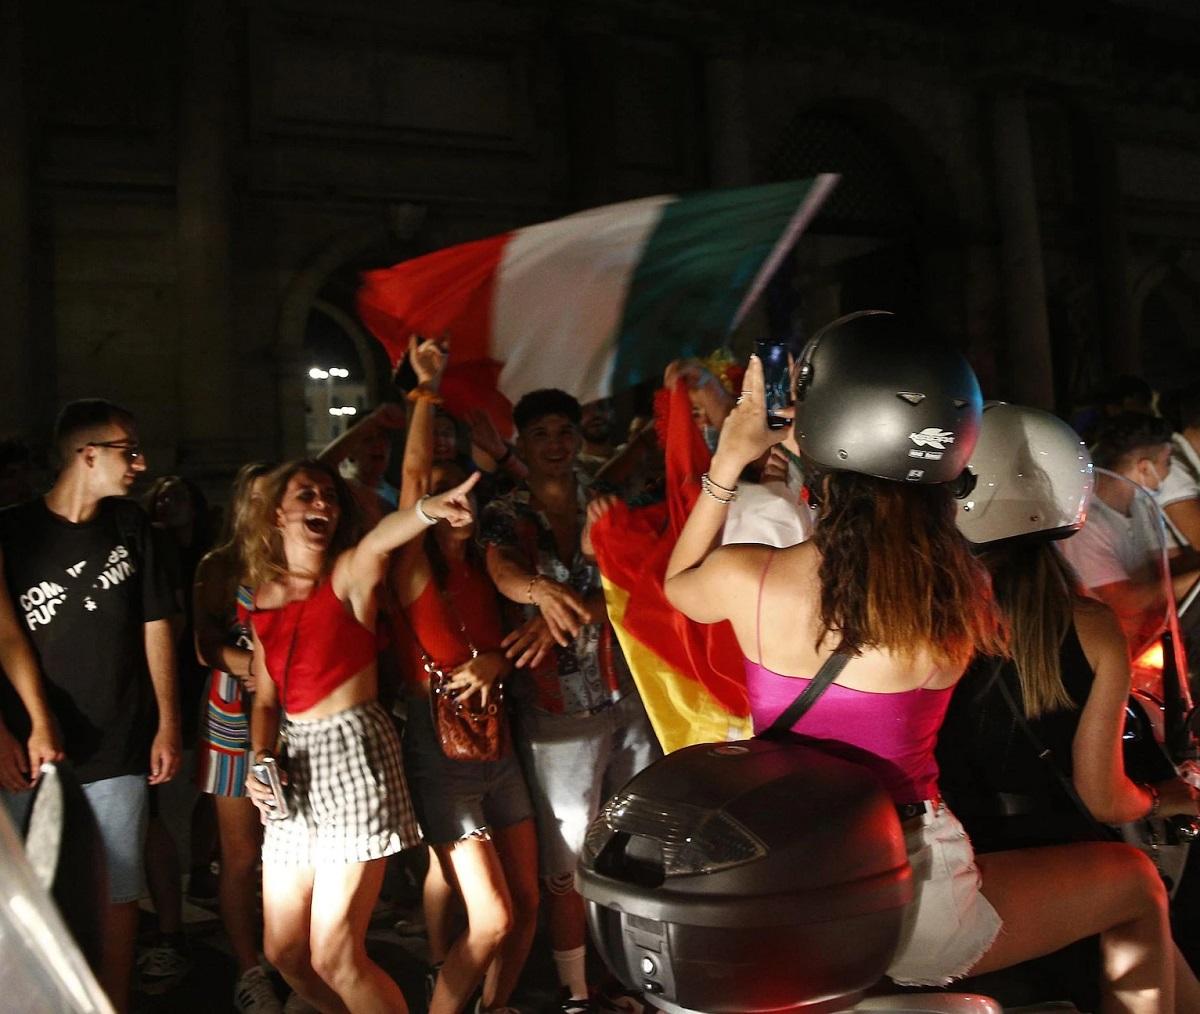 Roma focolaio Covid partita Italia Belgio 73 contagi